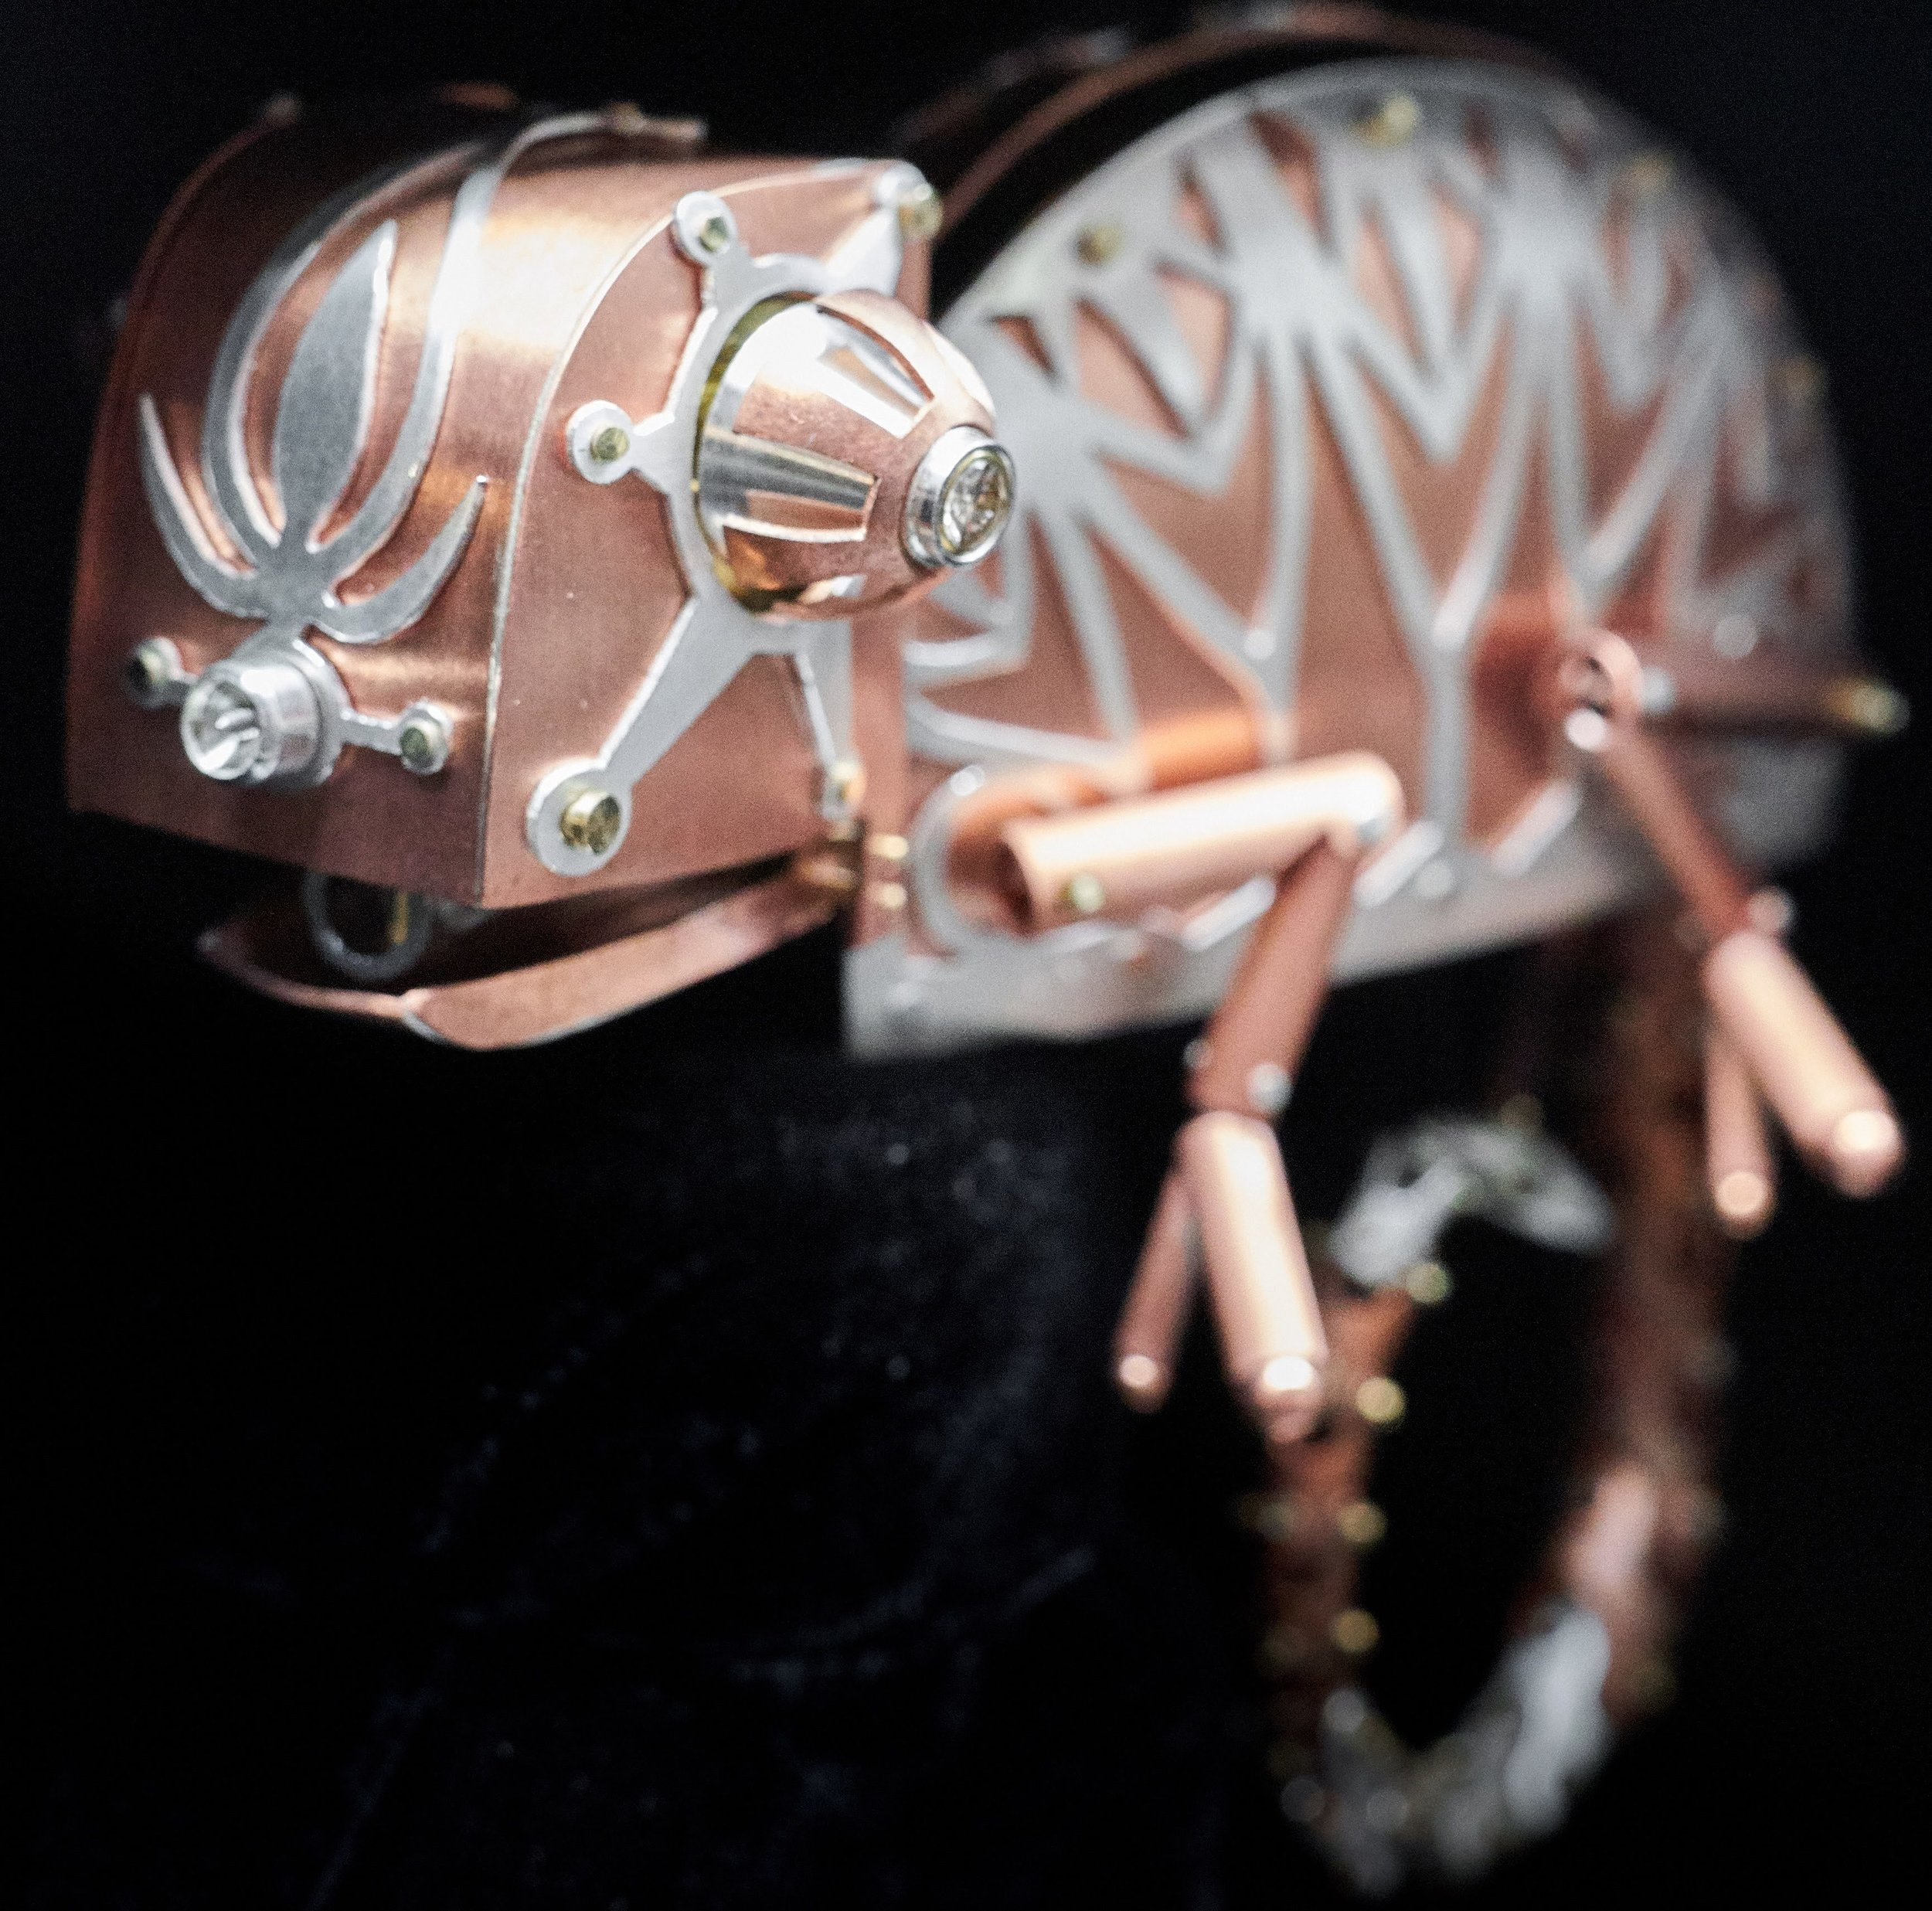 Chameleon Automaton